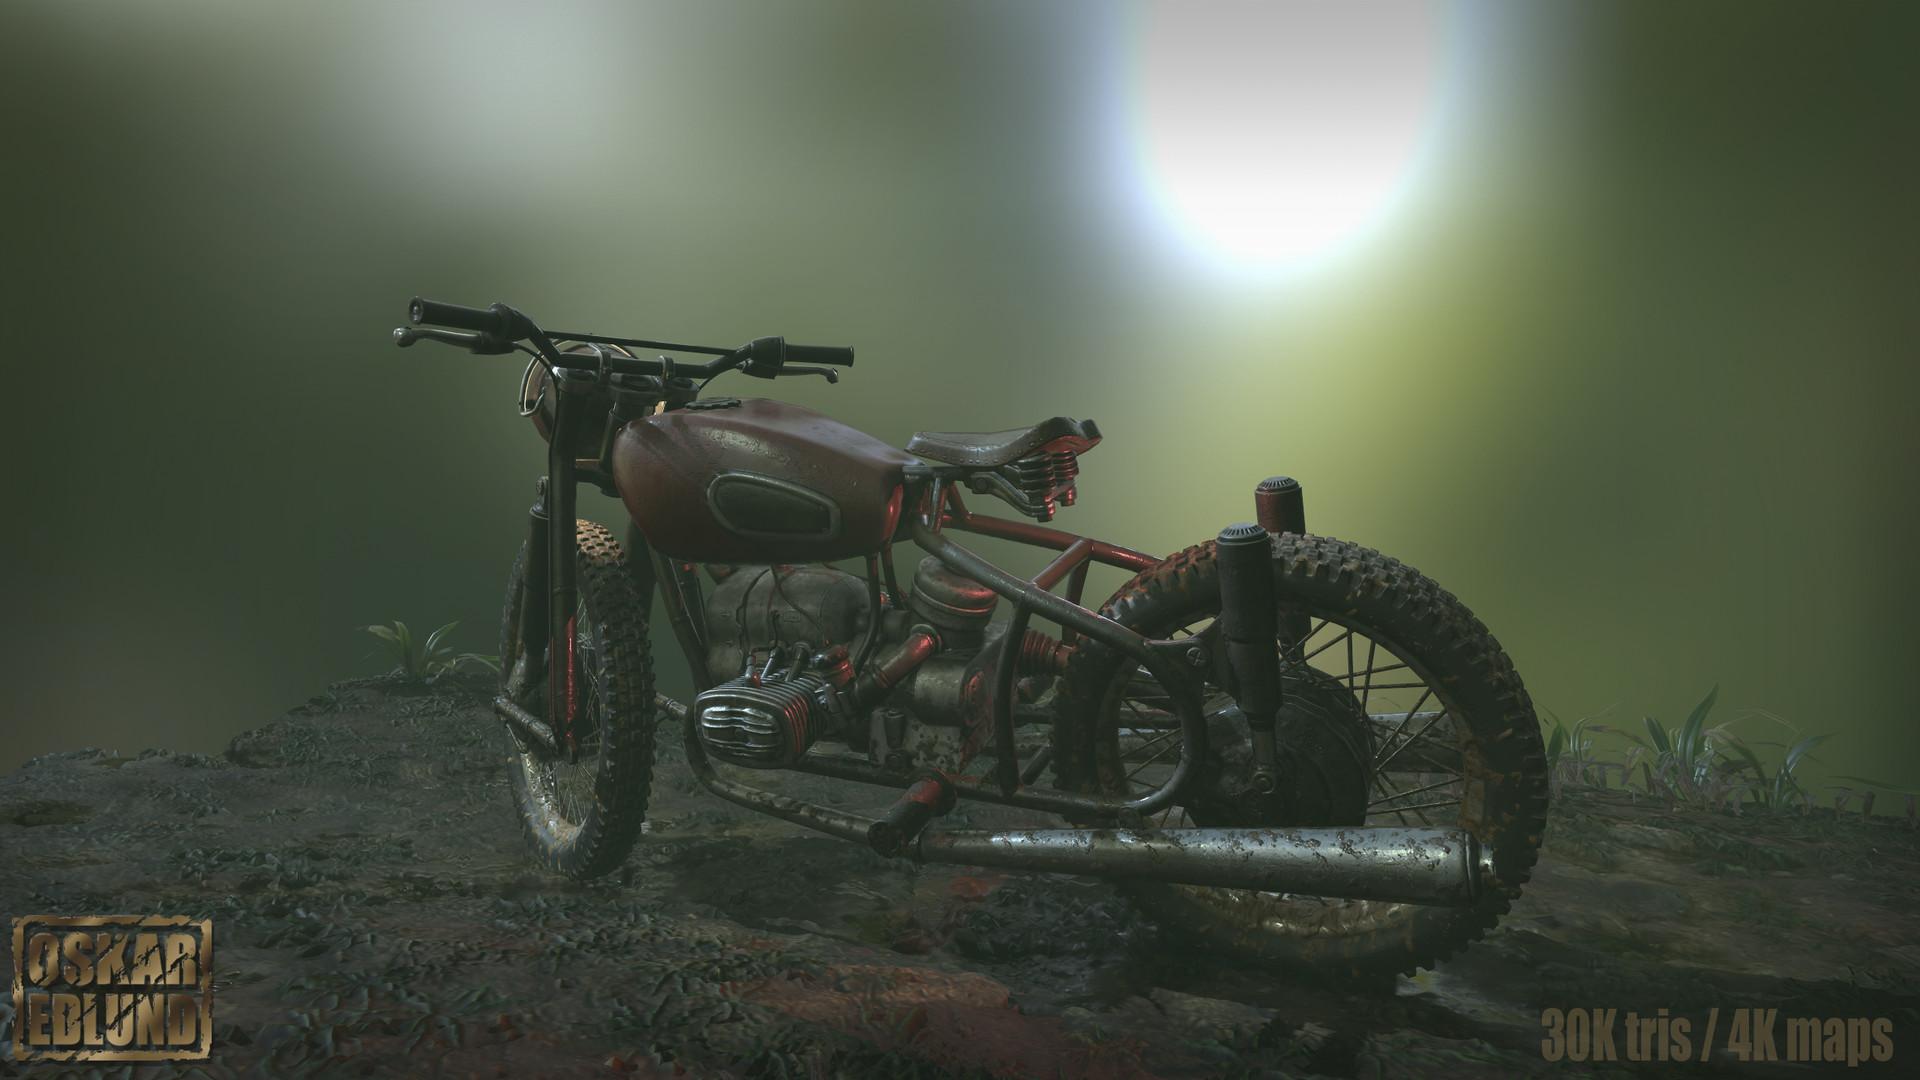 Oskar edlund bike 02